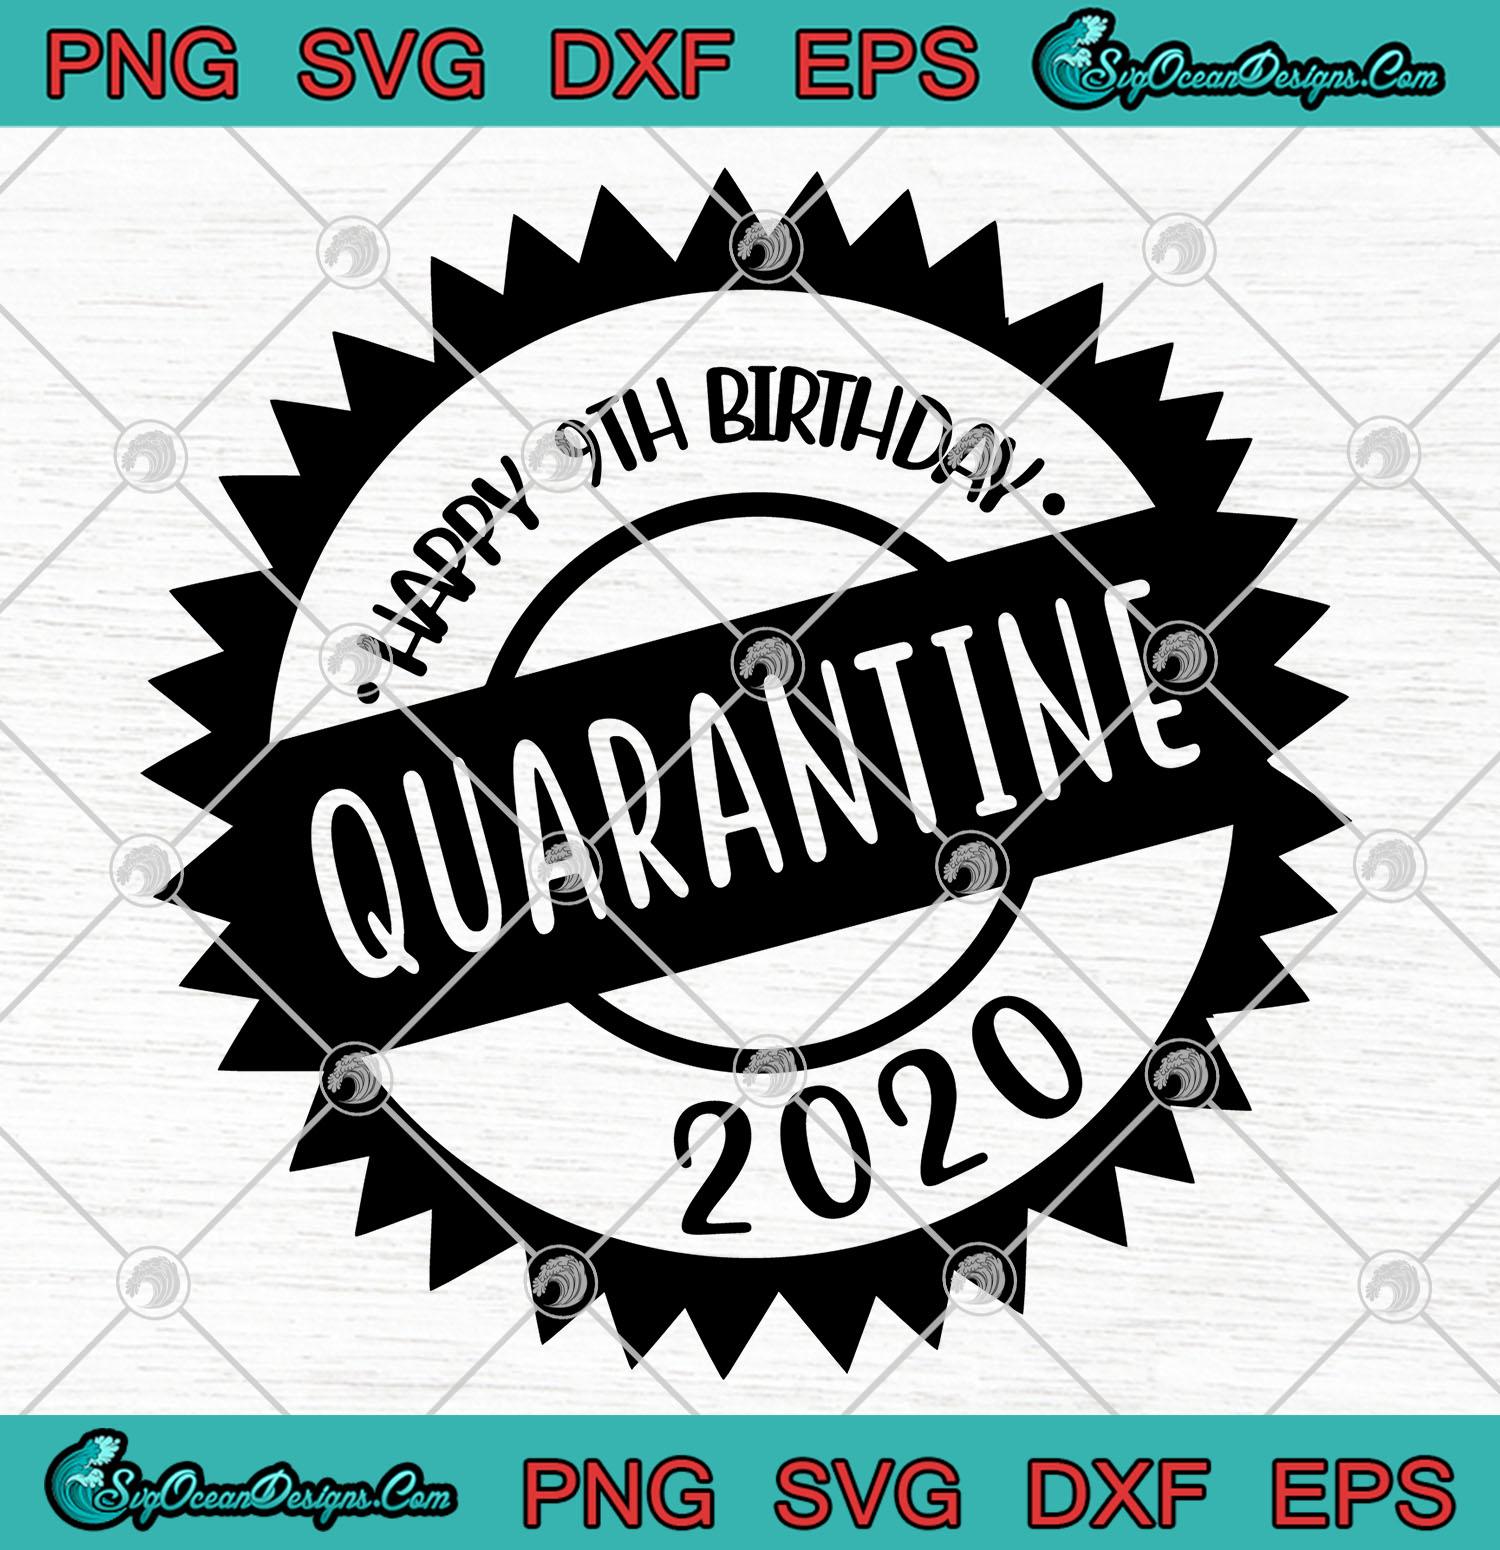 Happy 9th Birthday Quarantine 2020 Svg Png Eps Dxf Coronavirus Cutting File Cricut Silhouette Art Designs Digital Download